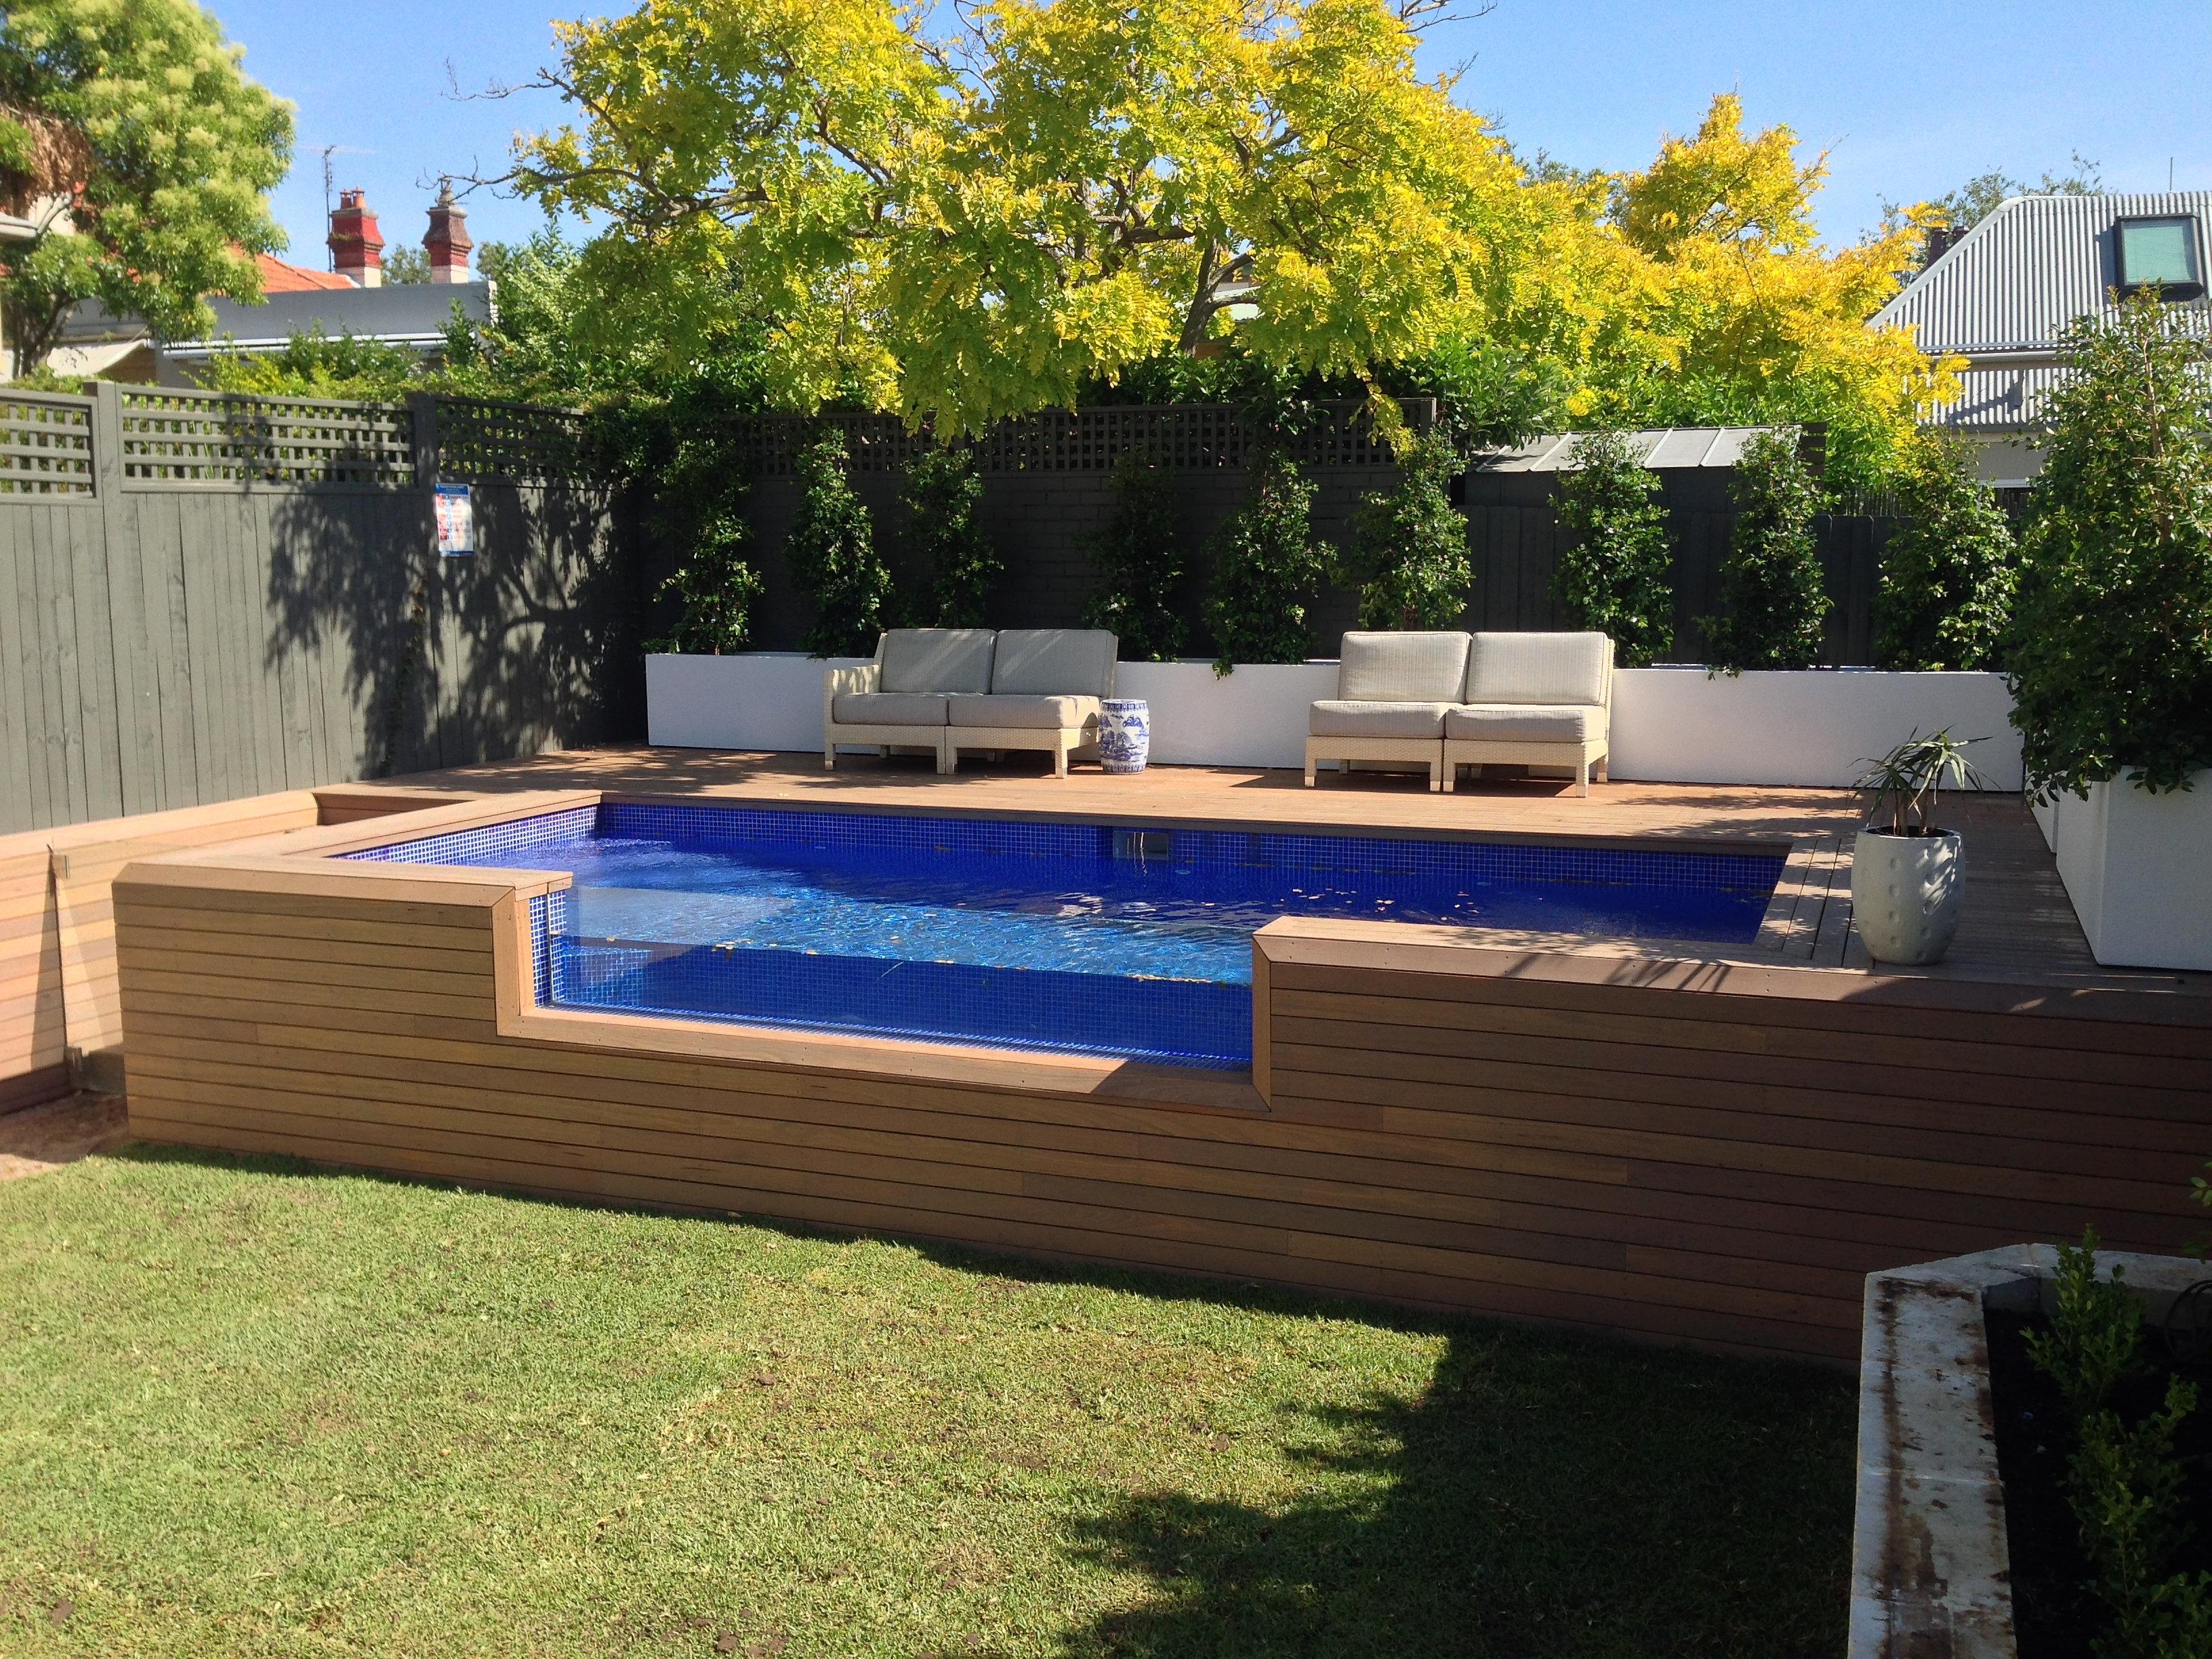 Domain pools sydney pool builder sydney north sydney for Pool showrooms sydney